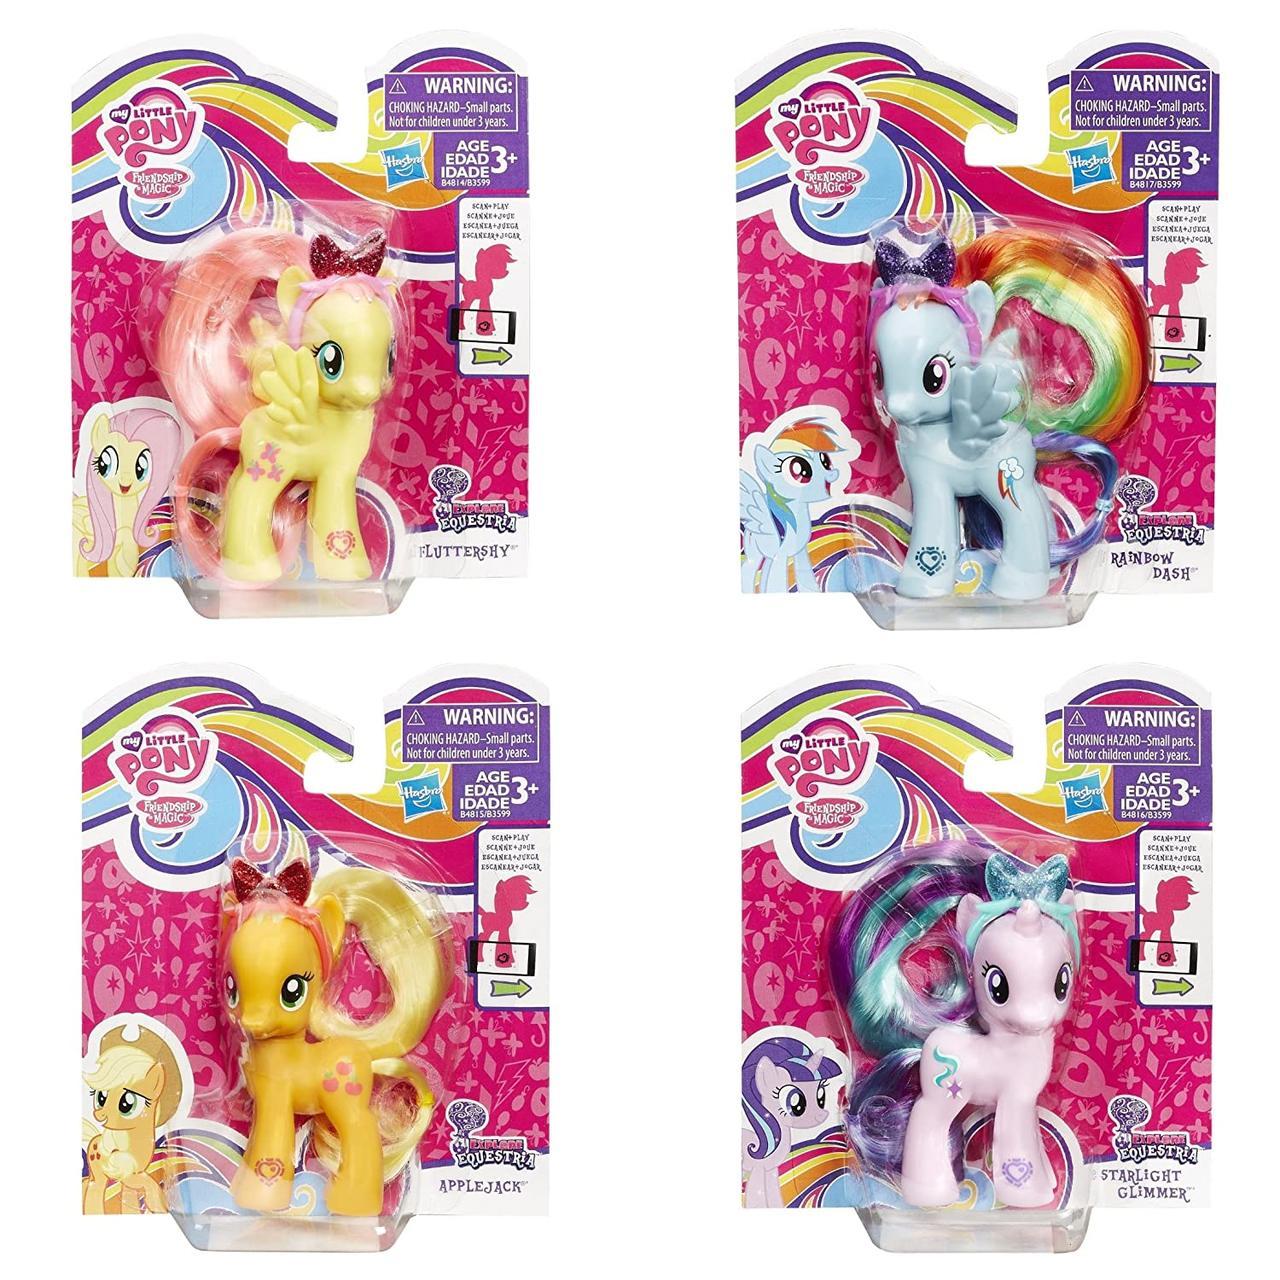 Базовая фигурка My Little Pony Радуга Дэш HASBRO B4817/astB3599 - фото 5